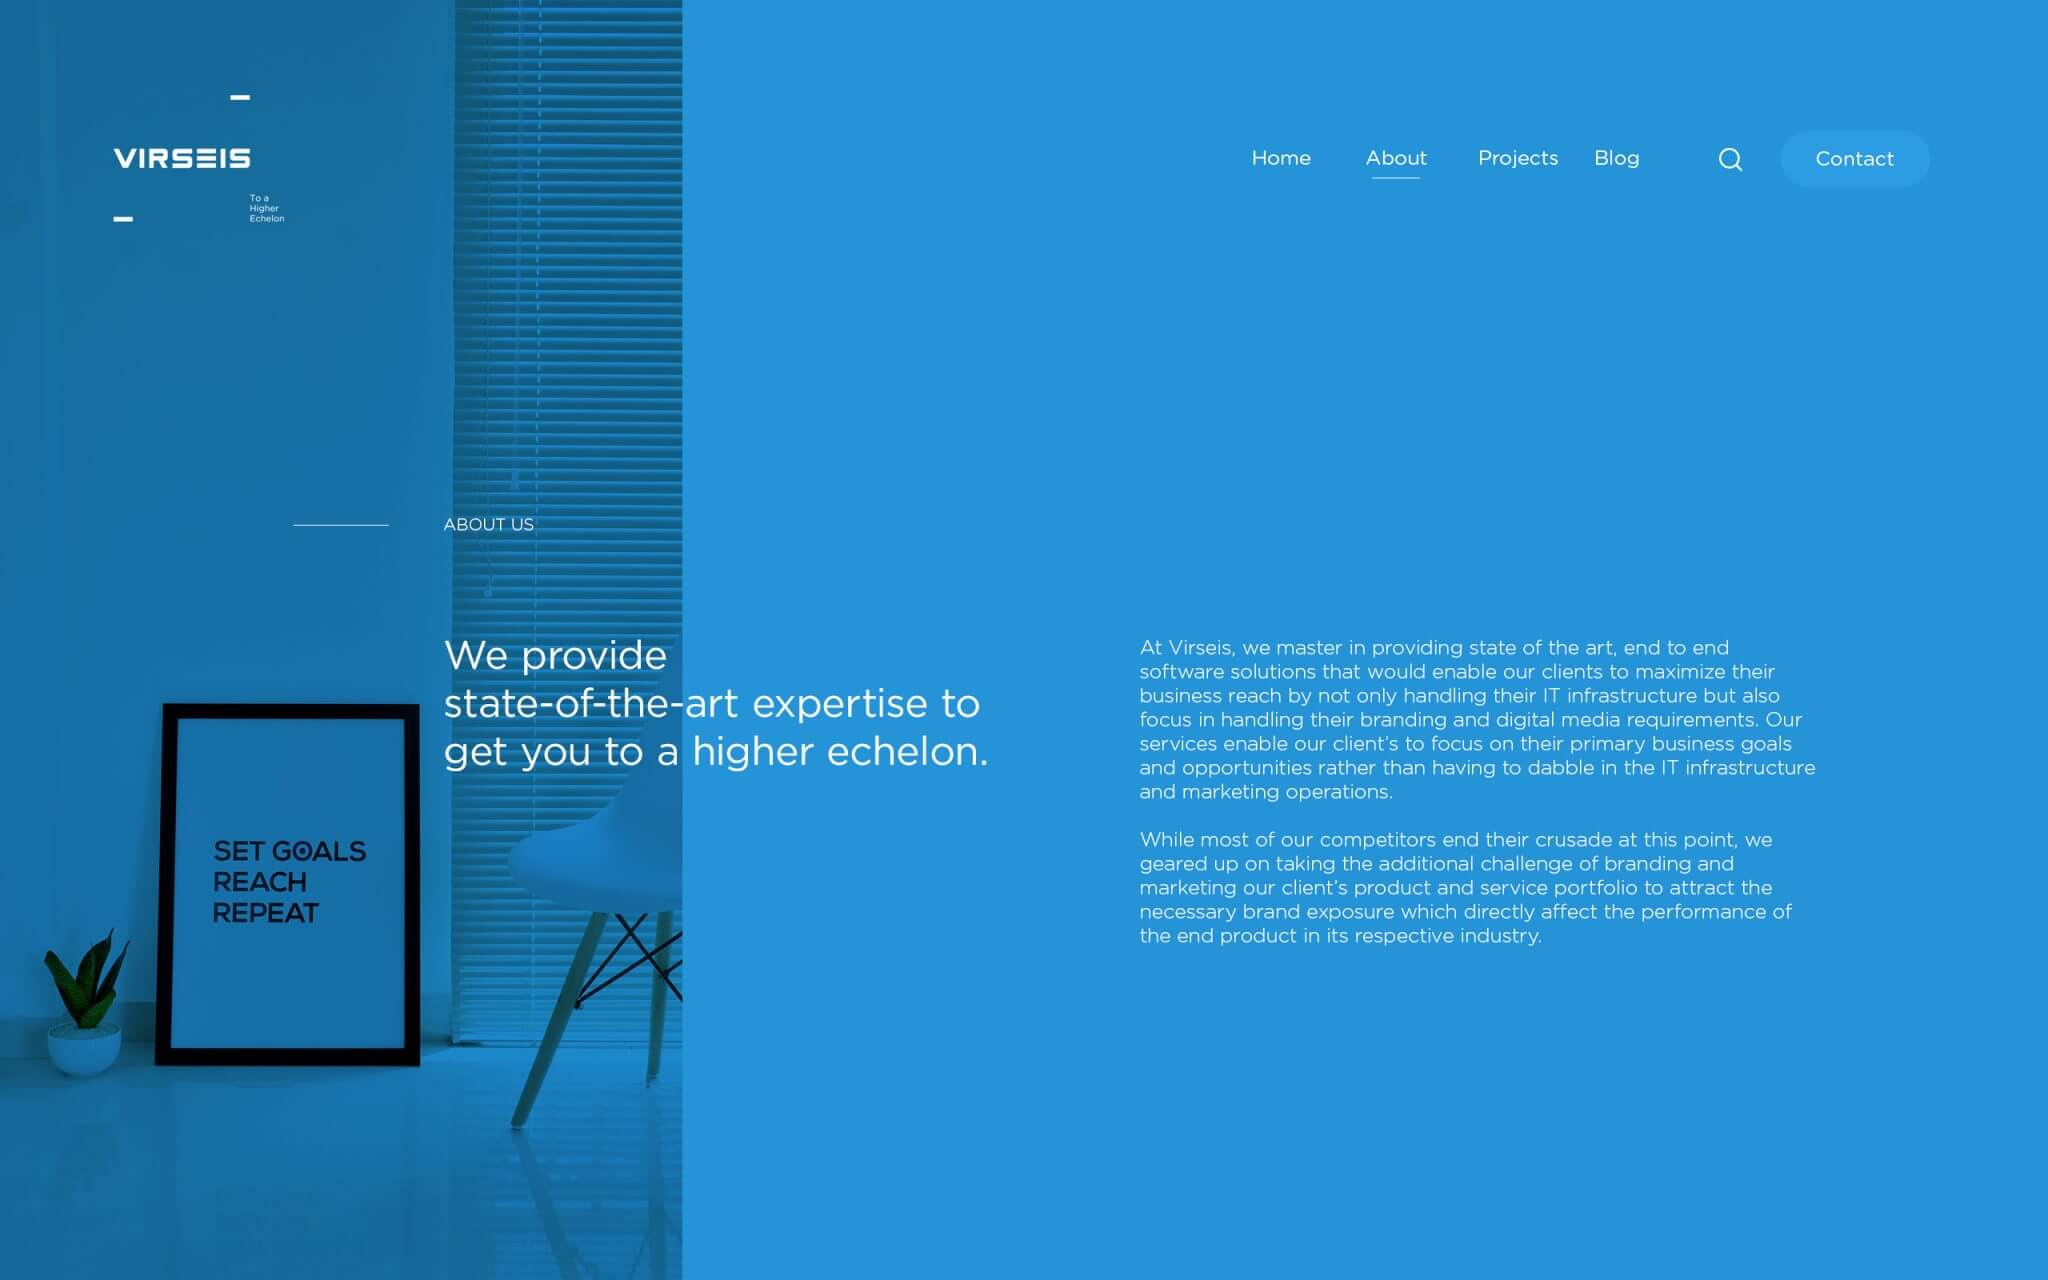 Virseis-web-about-us-UI-design